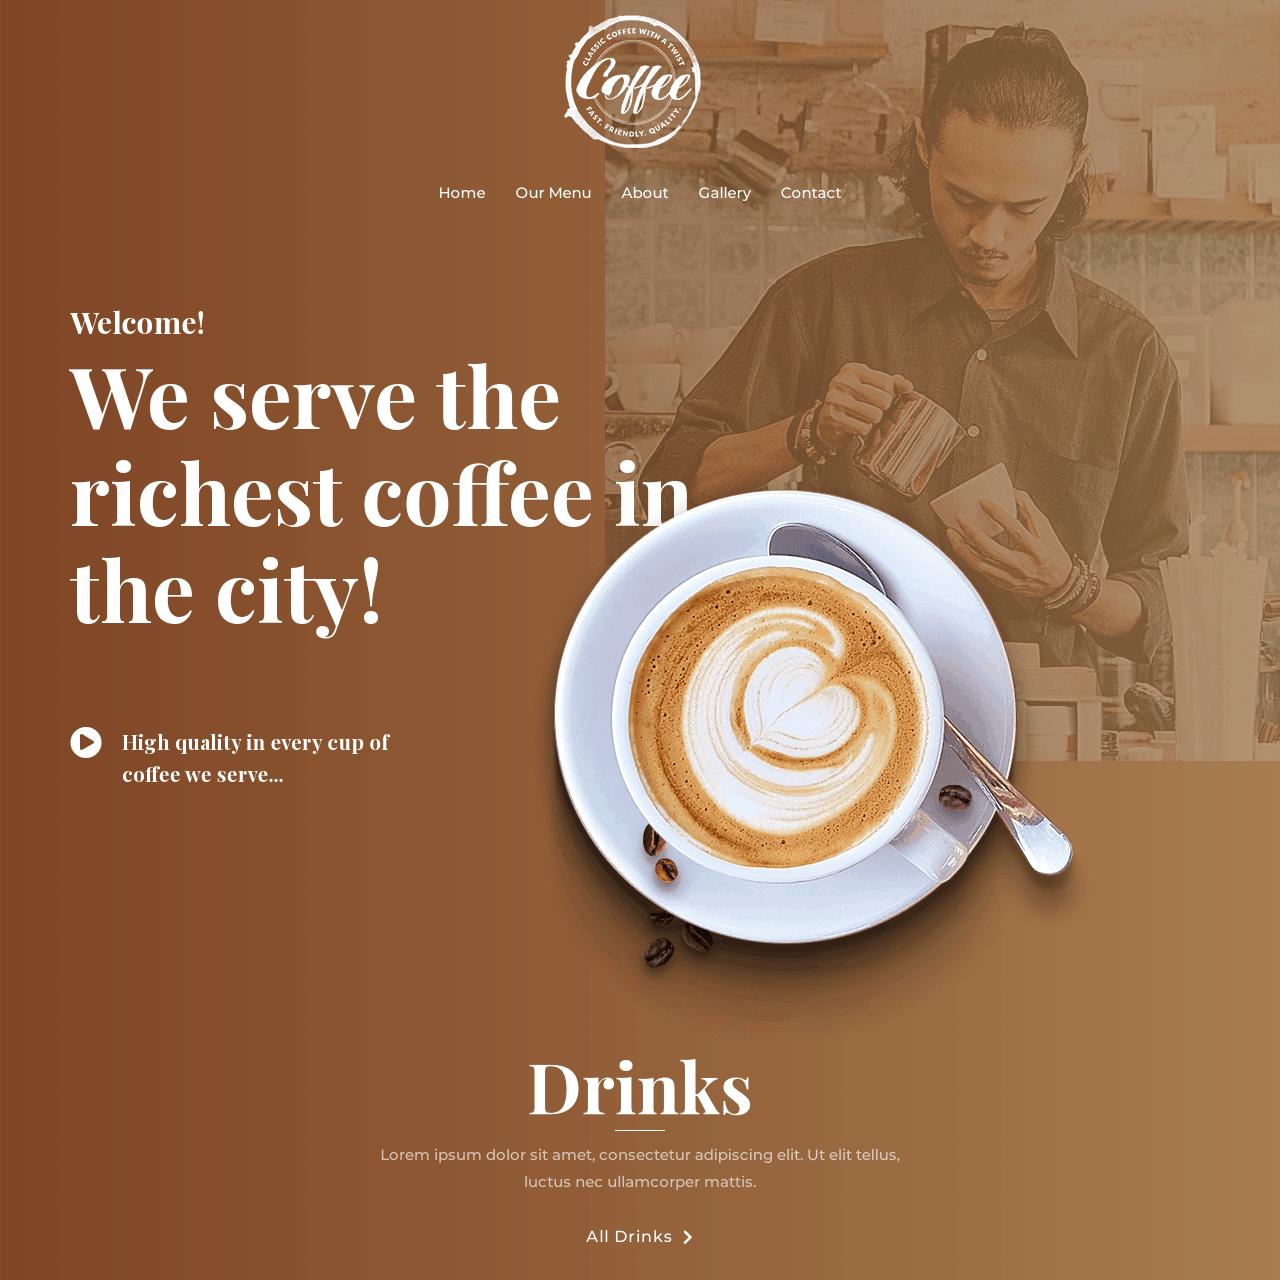 coffee-shop-website-design